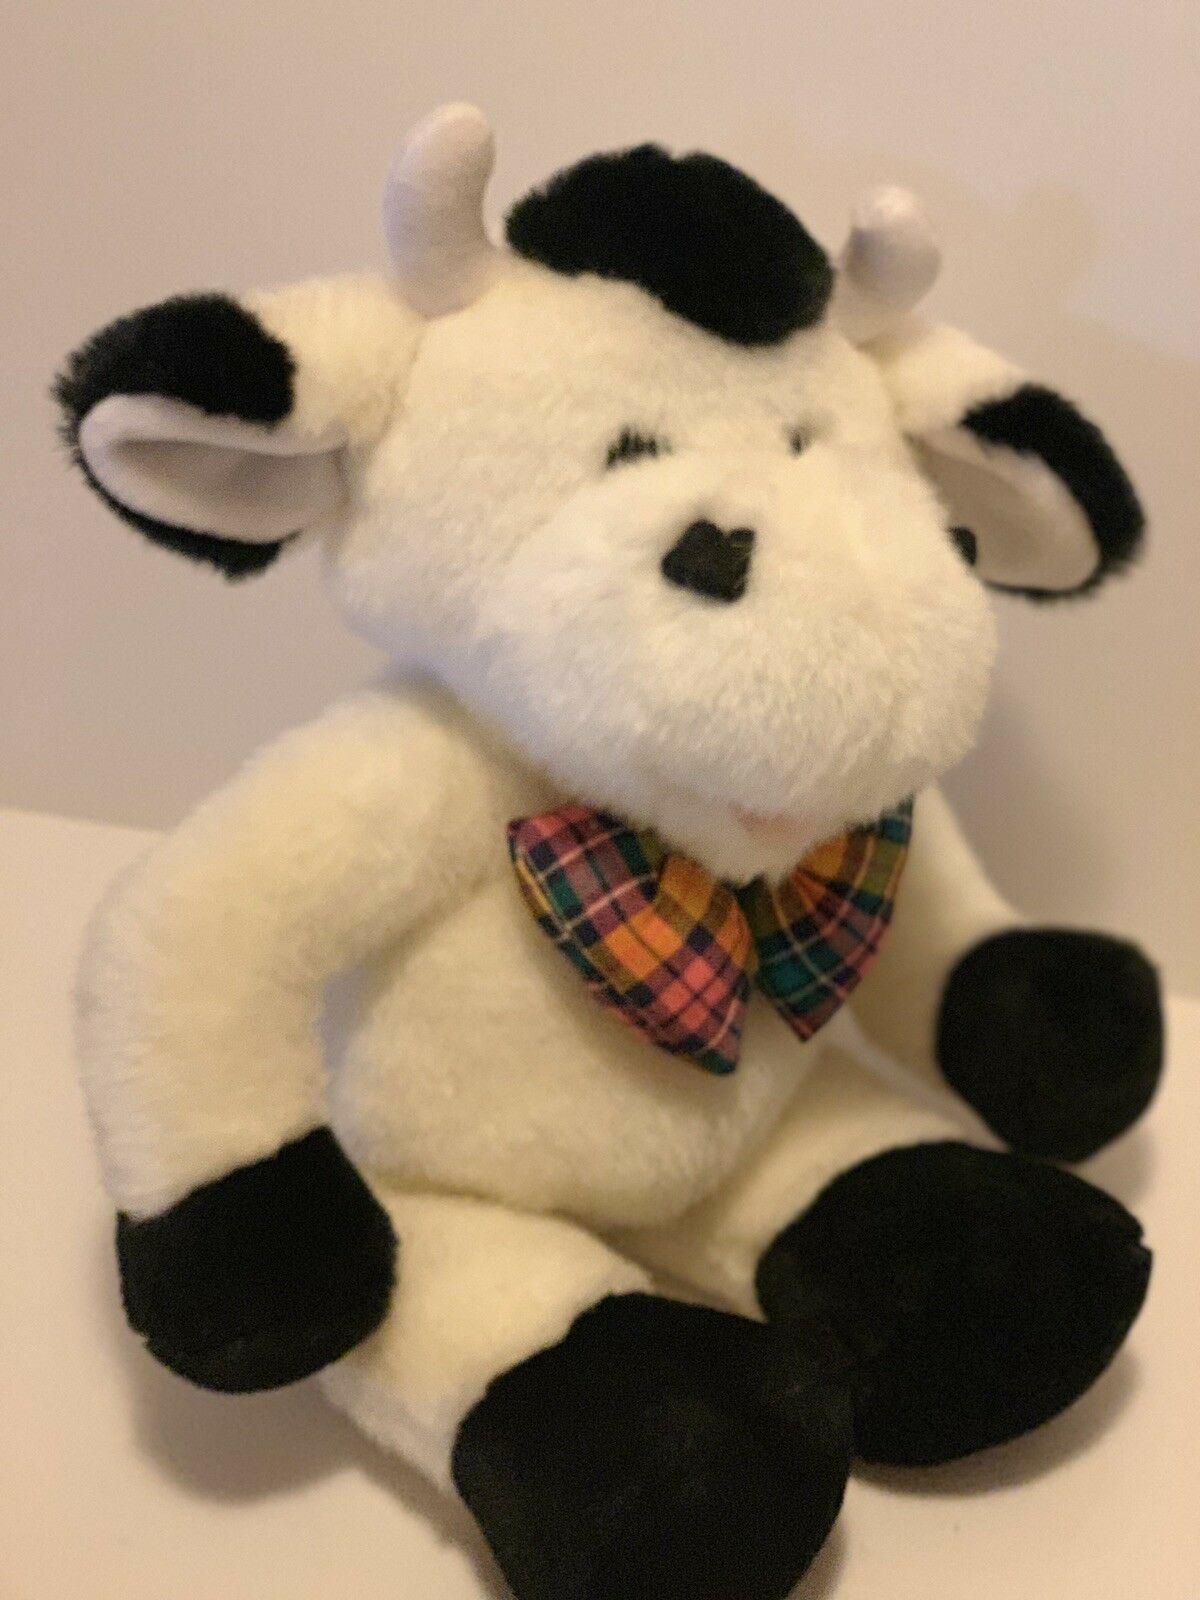 "Commonwealth Plush Cow Black White Stuffed Animal Plaid Bow Tie Soft 14"" Toy"